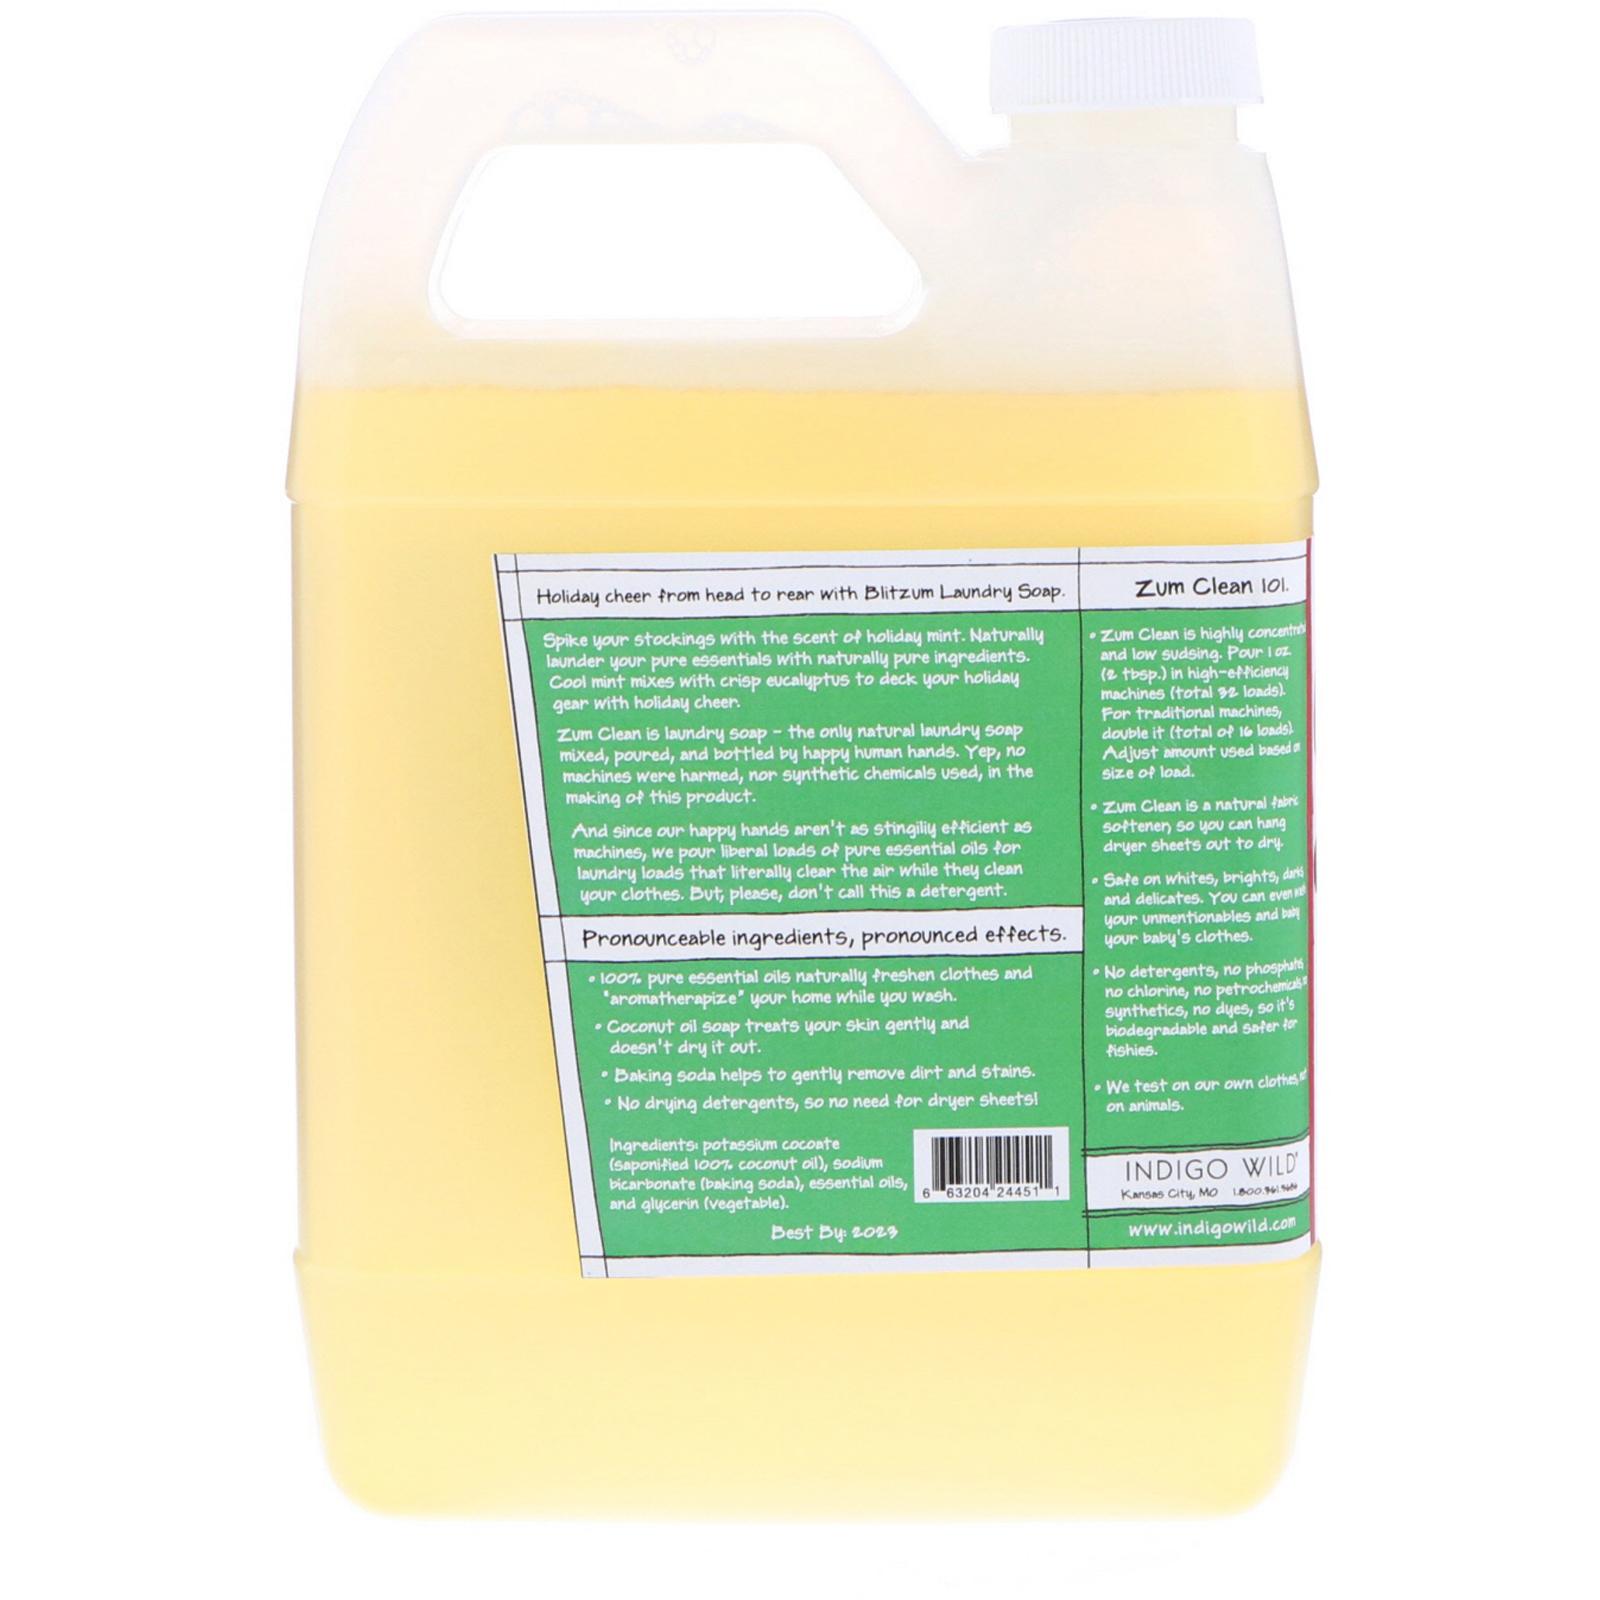 Indigo Wild Blitzum Zum Clean Aromatherapy Laundry Soap Holiday